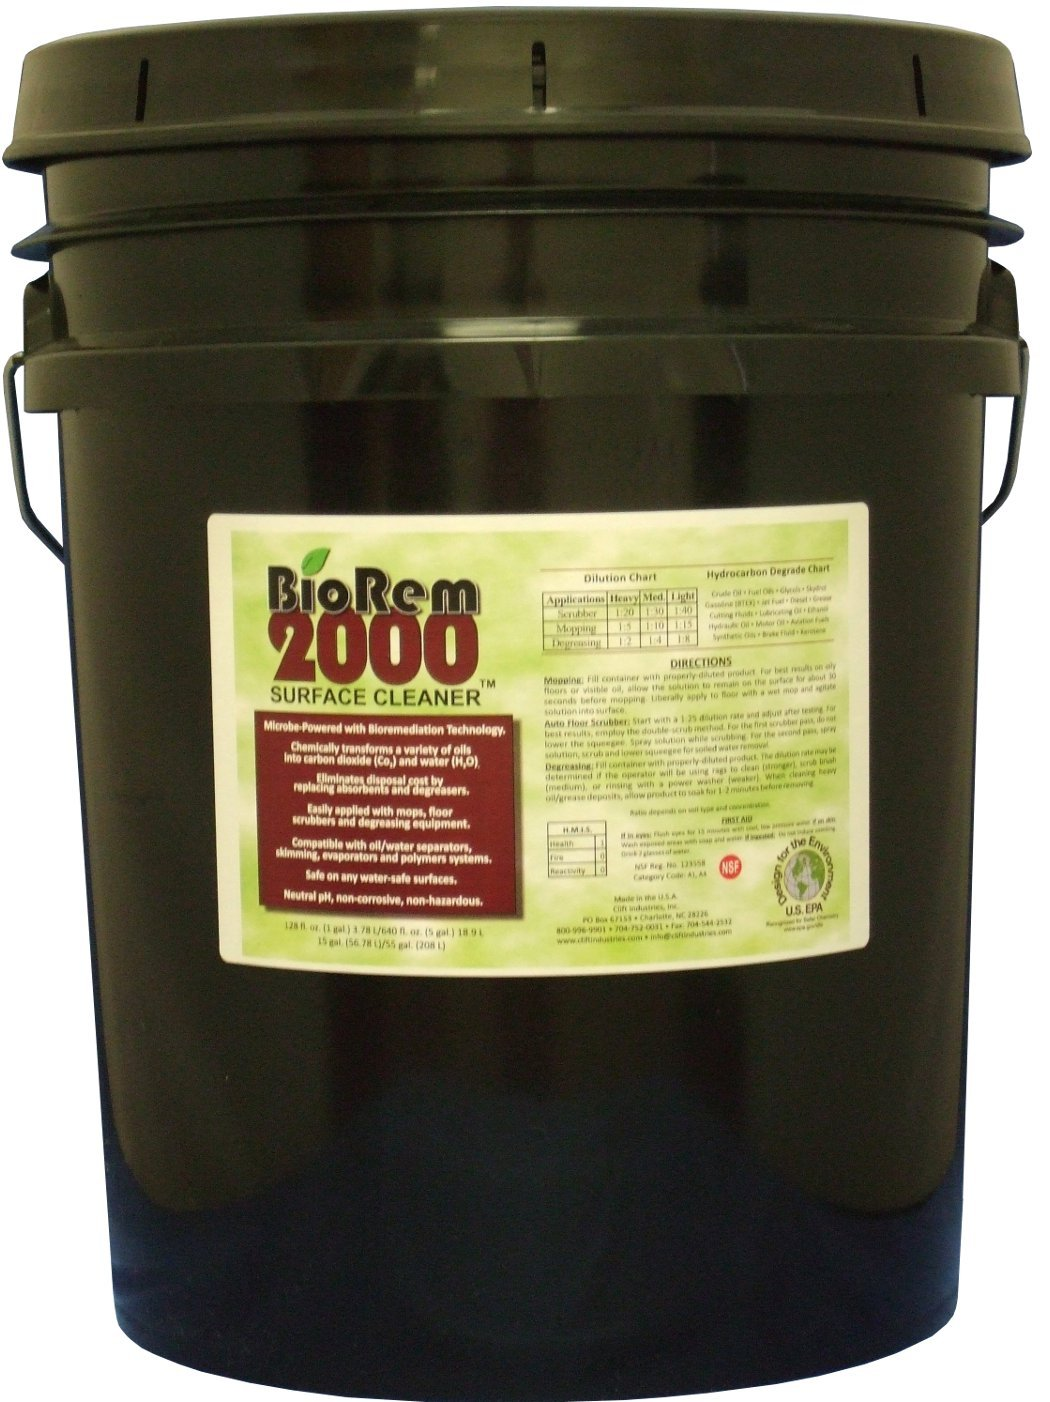 Clift Industries 8008-005 BioRem-2000 Surface Cleaner, 5-Gallon Bucket